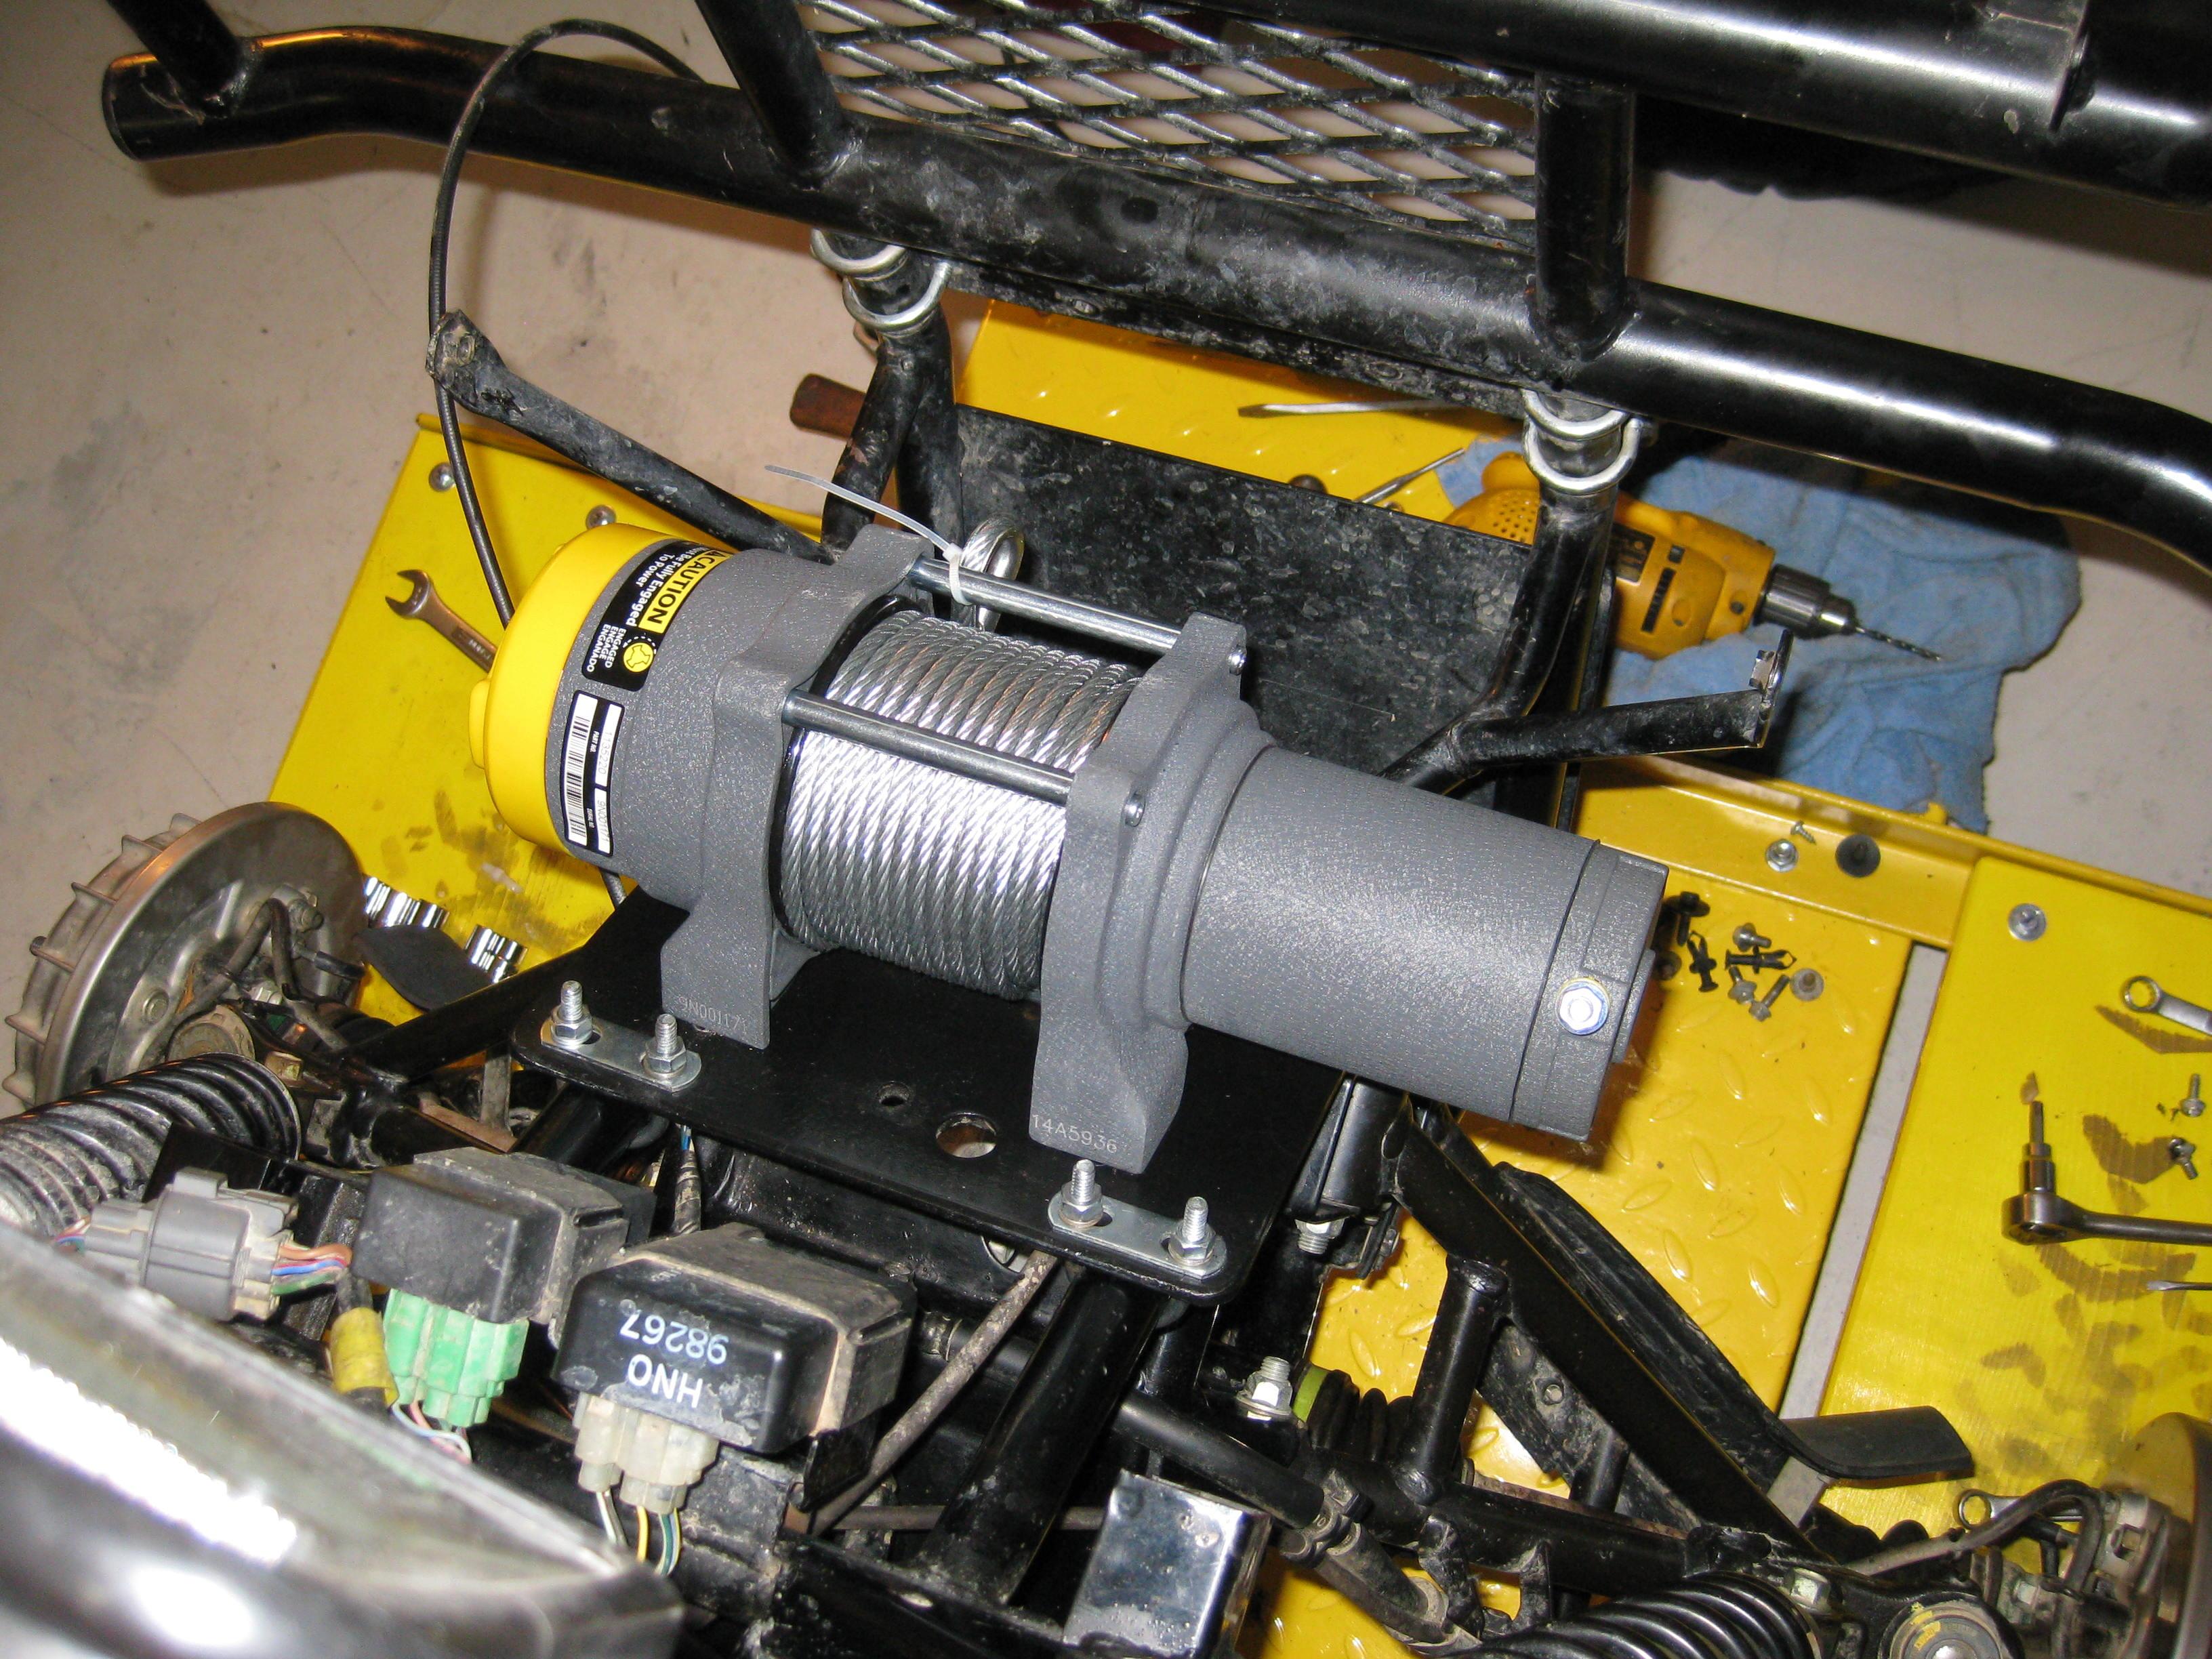 19900d1407382897 amazon com superwinch terra 35 img_1350 amazon com superwinch terra 35 honda atv forum superwinch terra 45 wiring diagram at gsmx.co